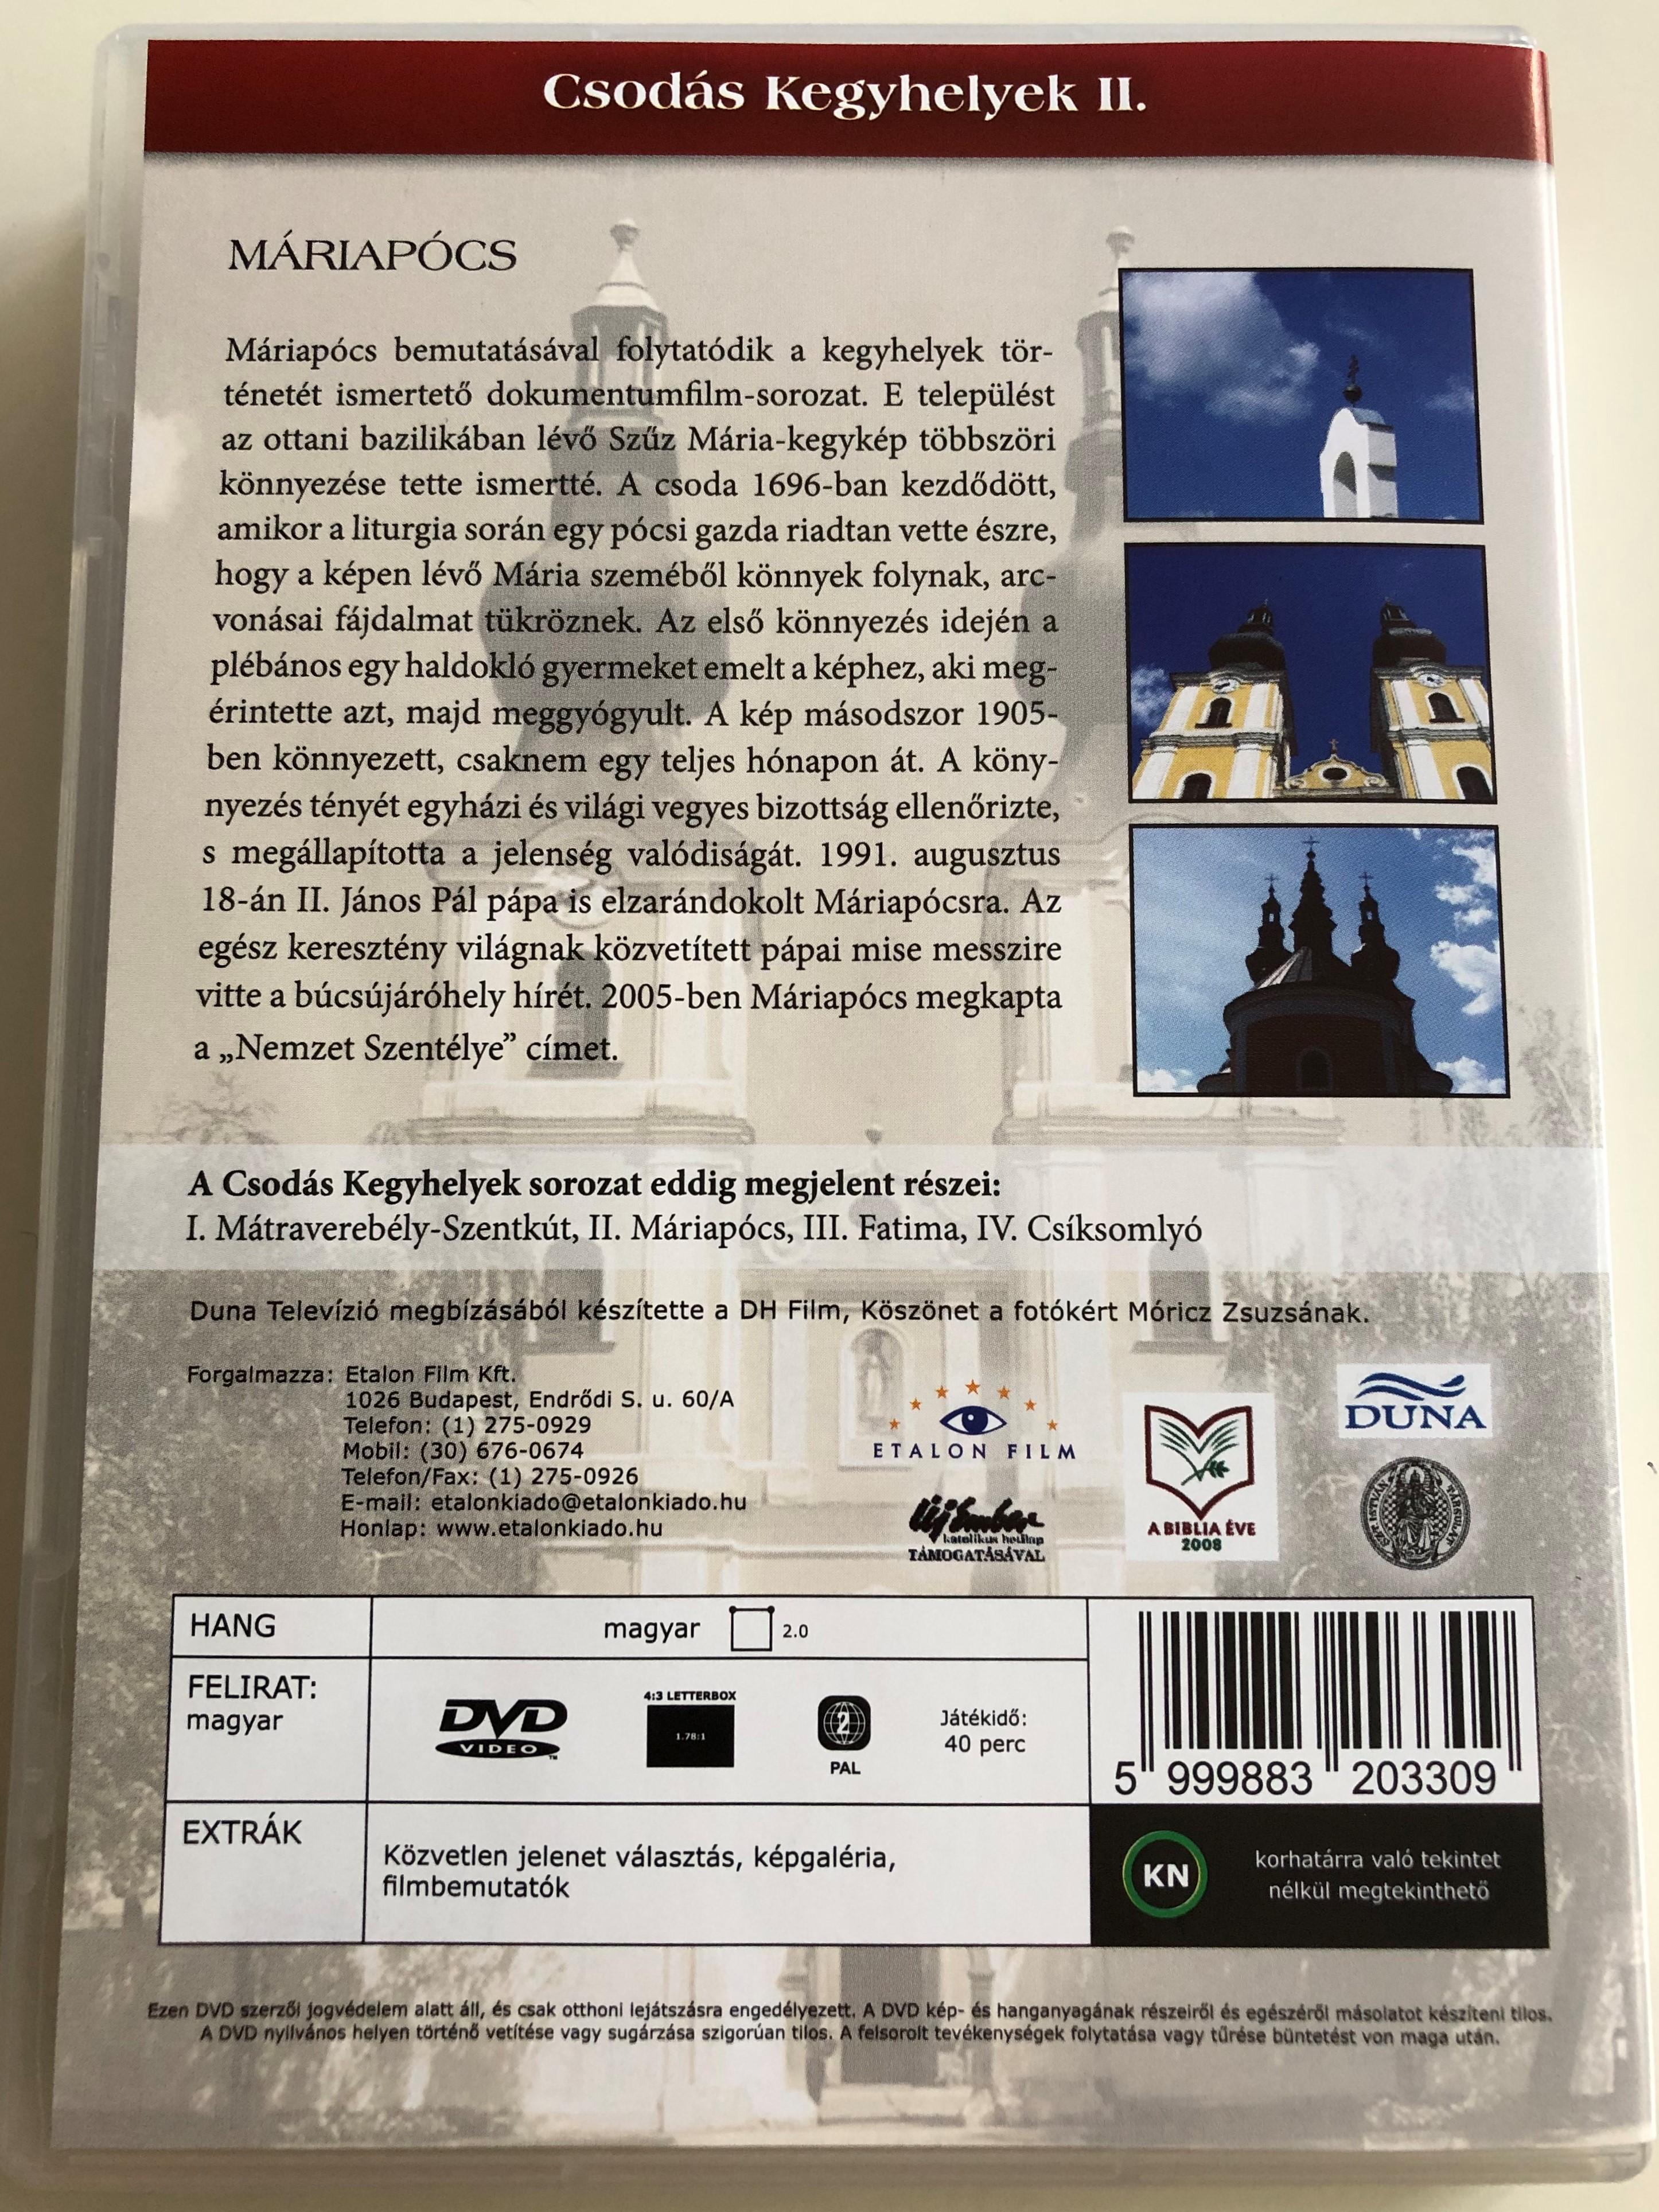 m-riap-cs-csod-s-kegyhelyek-ii.-dvd-2008-hungarian-documentary-presentation-about-m-riap-cs-and-its-town-church-3-.jpg